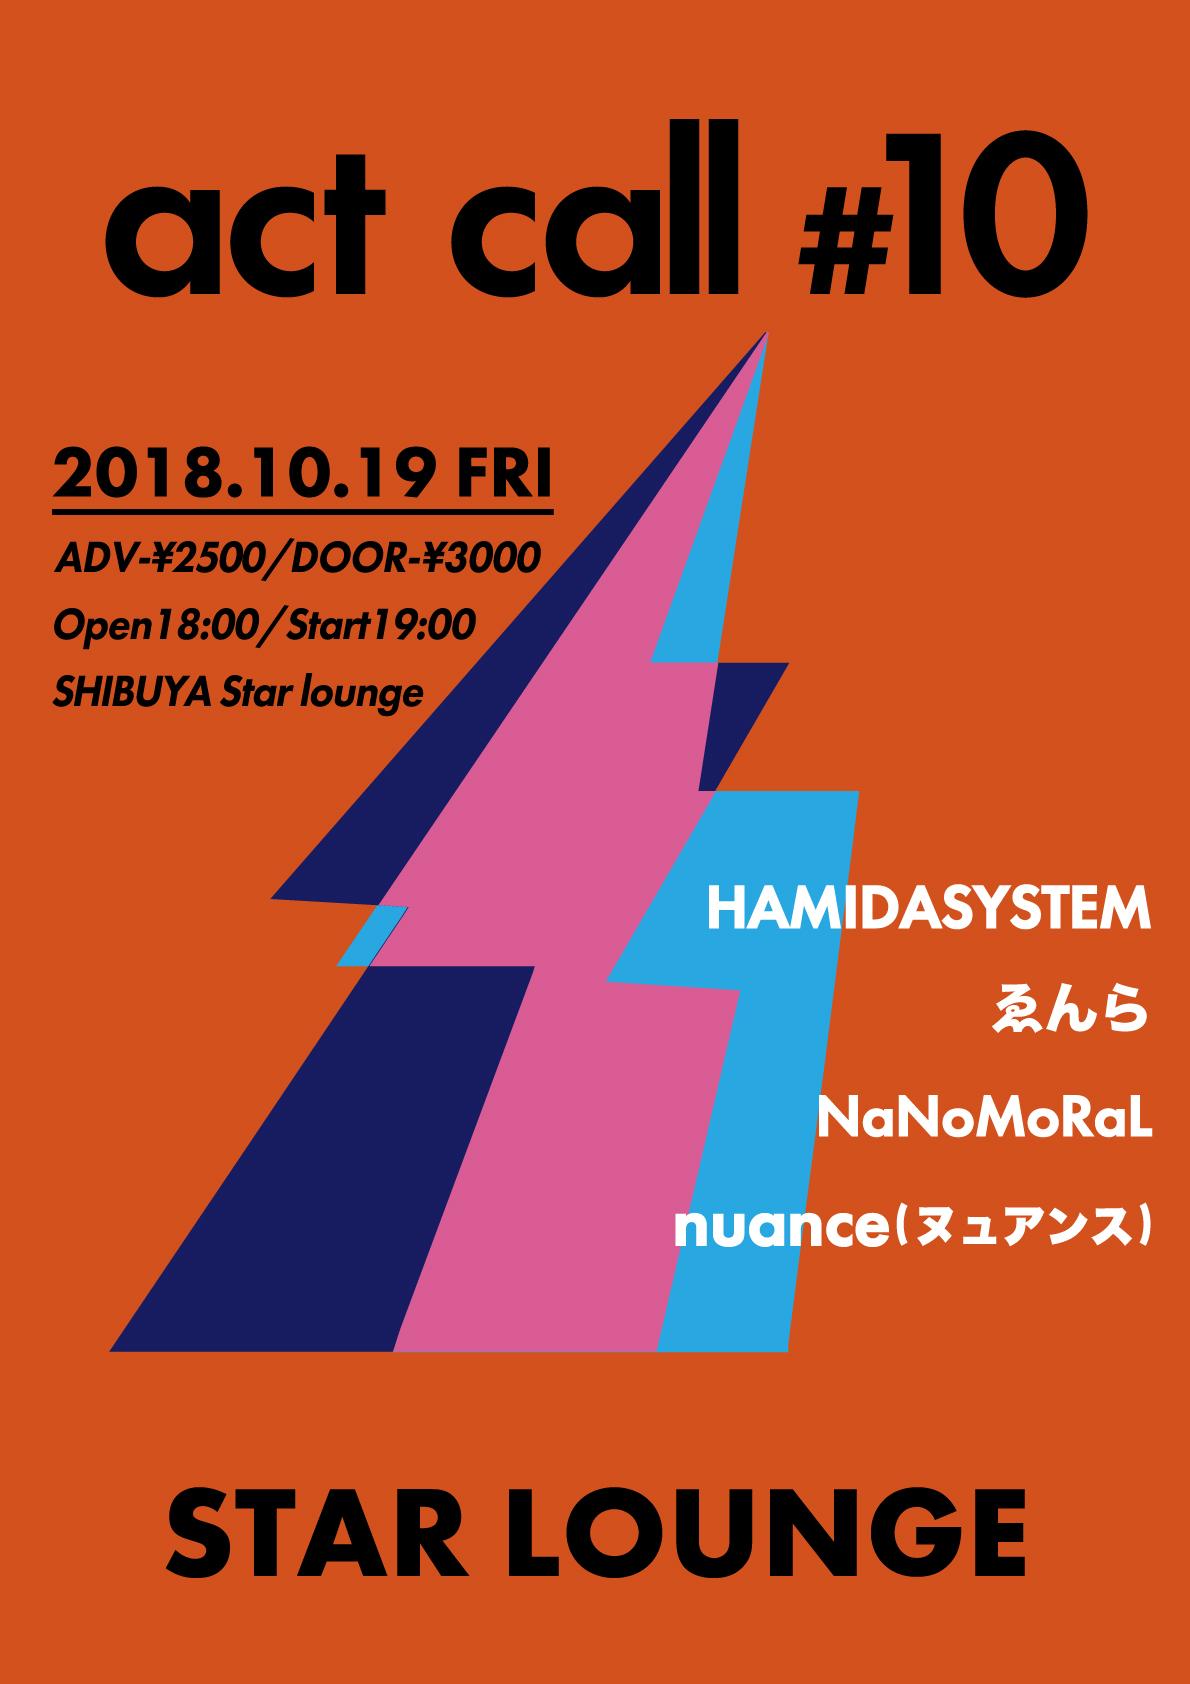 HAMIDASYSTEM presents「act call #10」